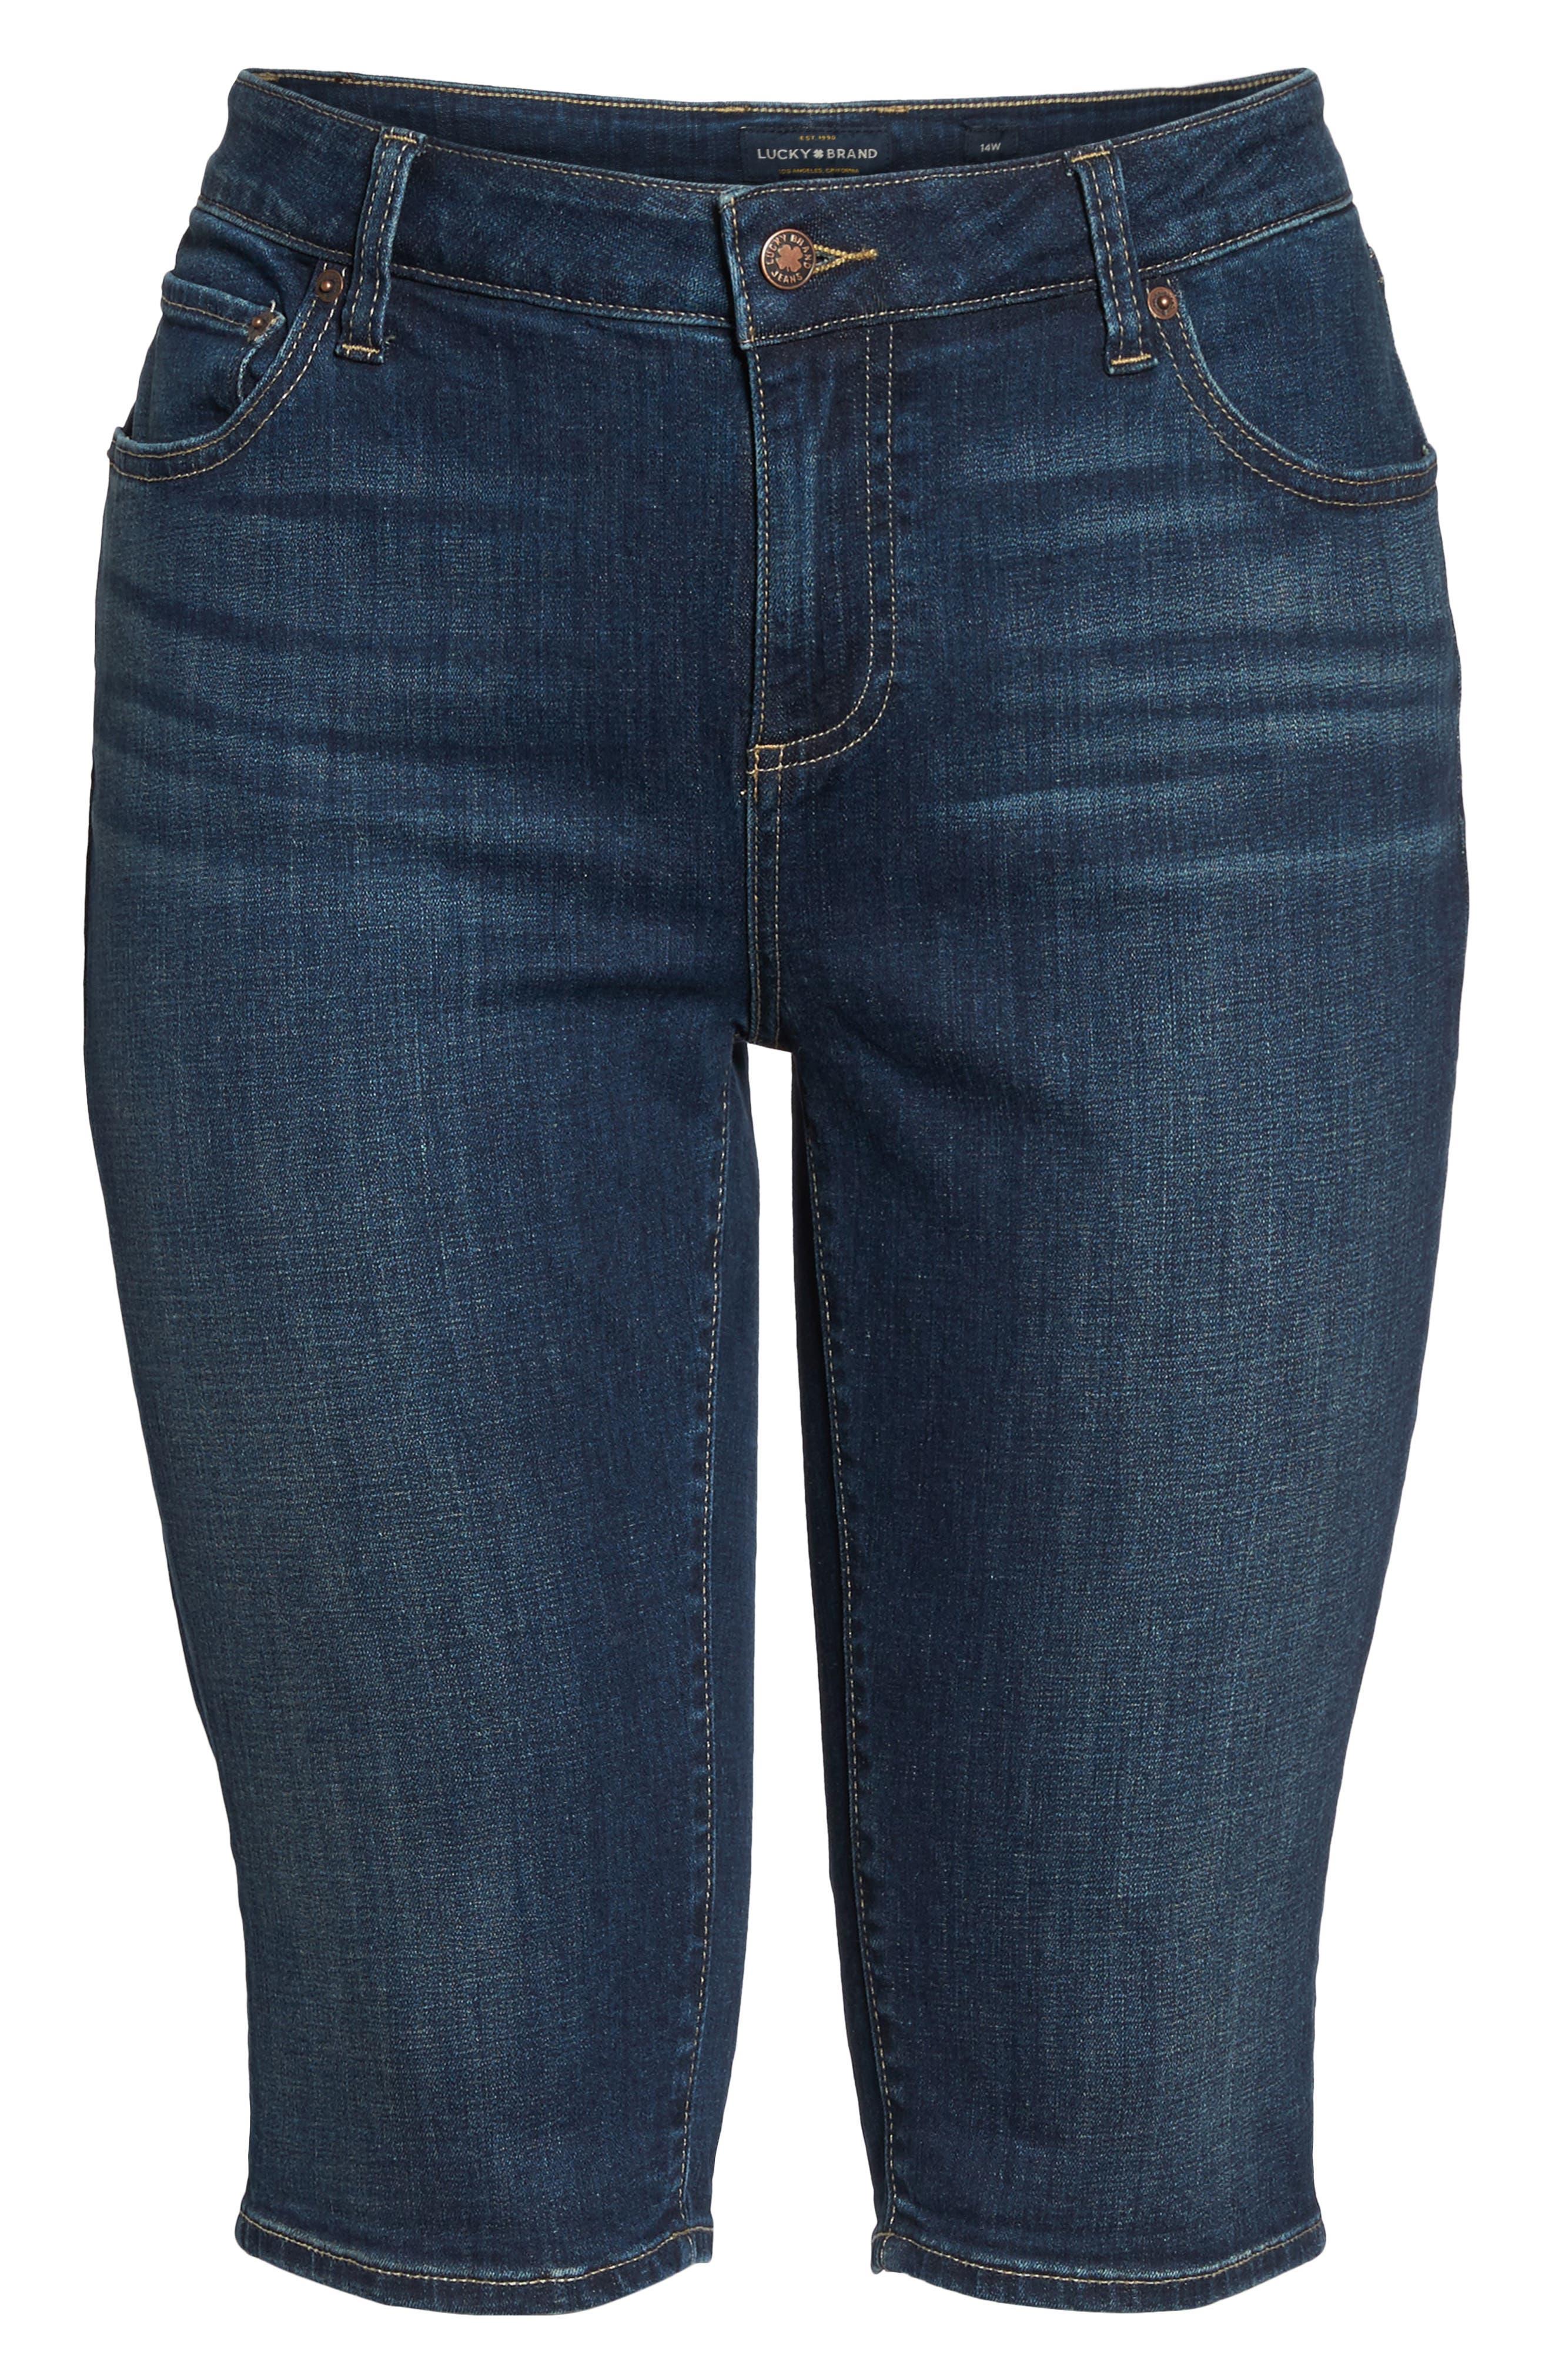 Ginger Bermuda Shorts,                             Alternate thumbnail 6, color,                             Marana-P